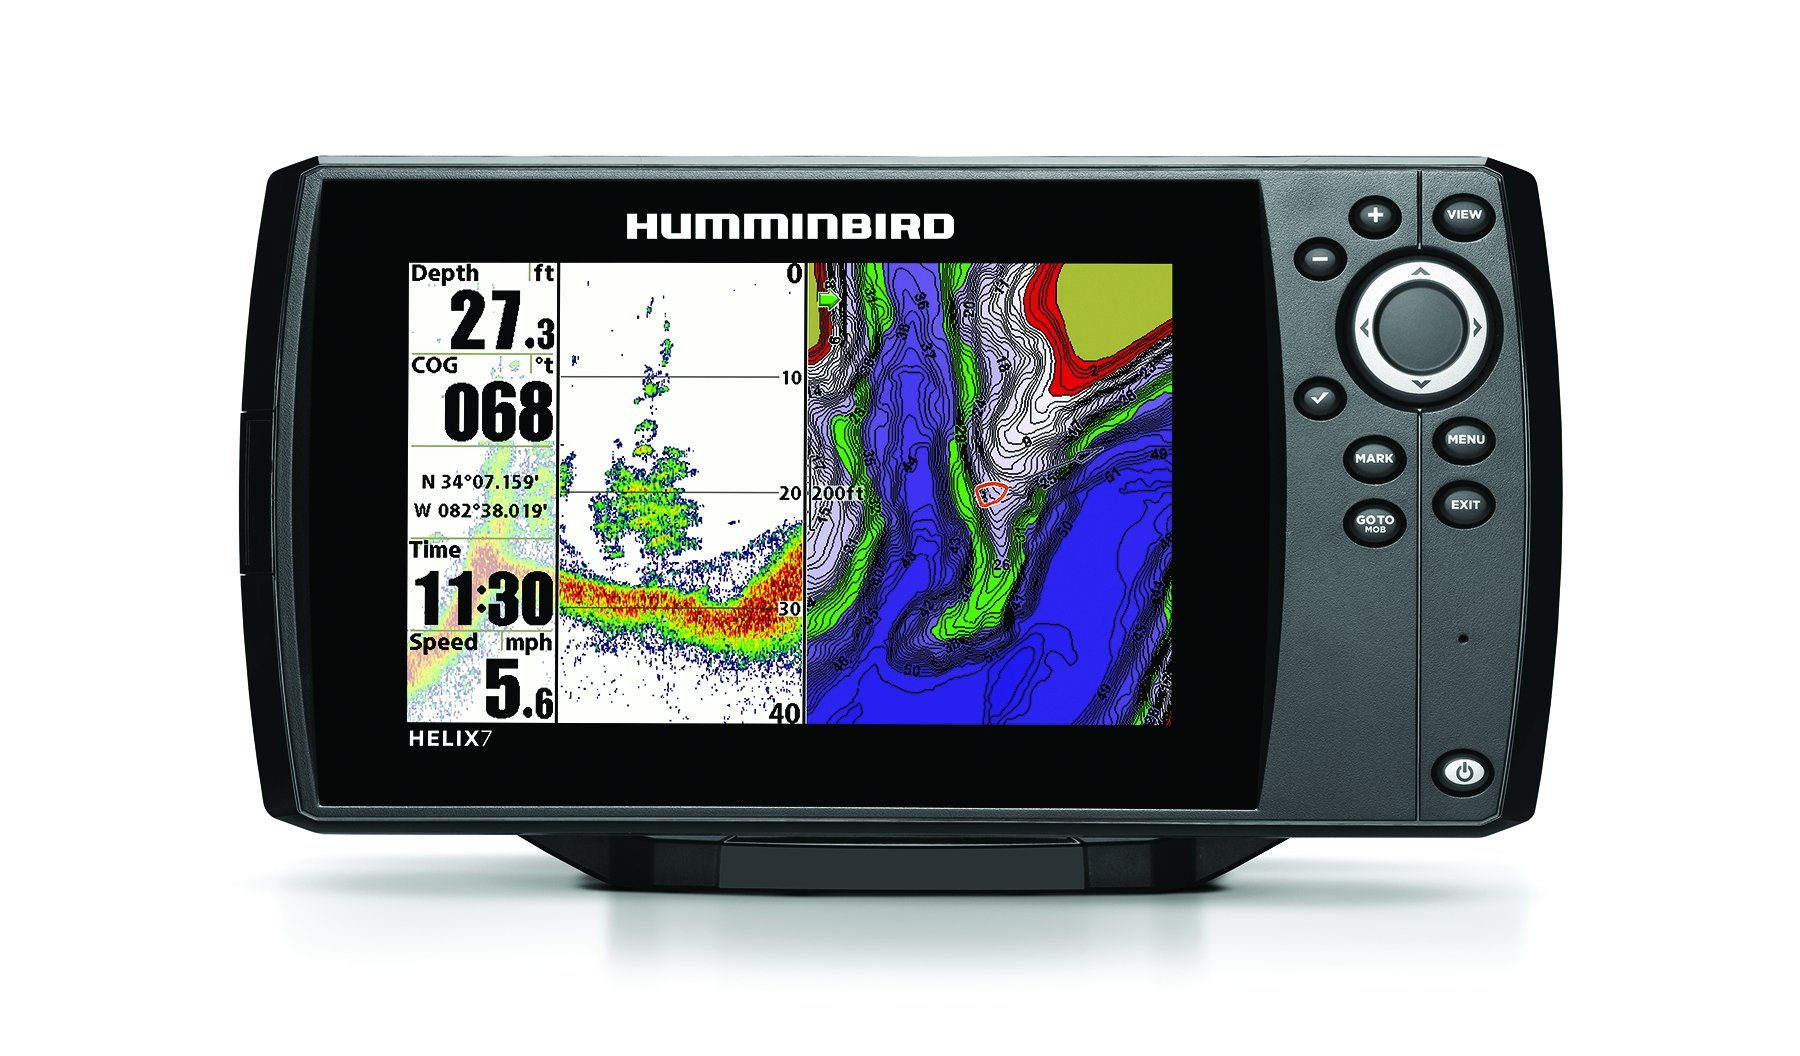 Humminbird 409820-1 Helix 7 Fishfinder/GPS with Dual Beam Plus Sonar by Humminbird